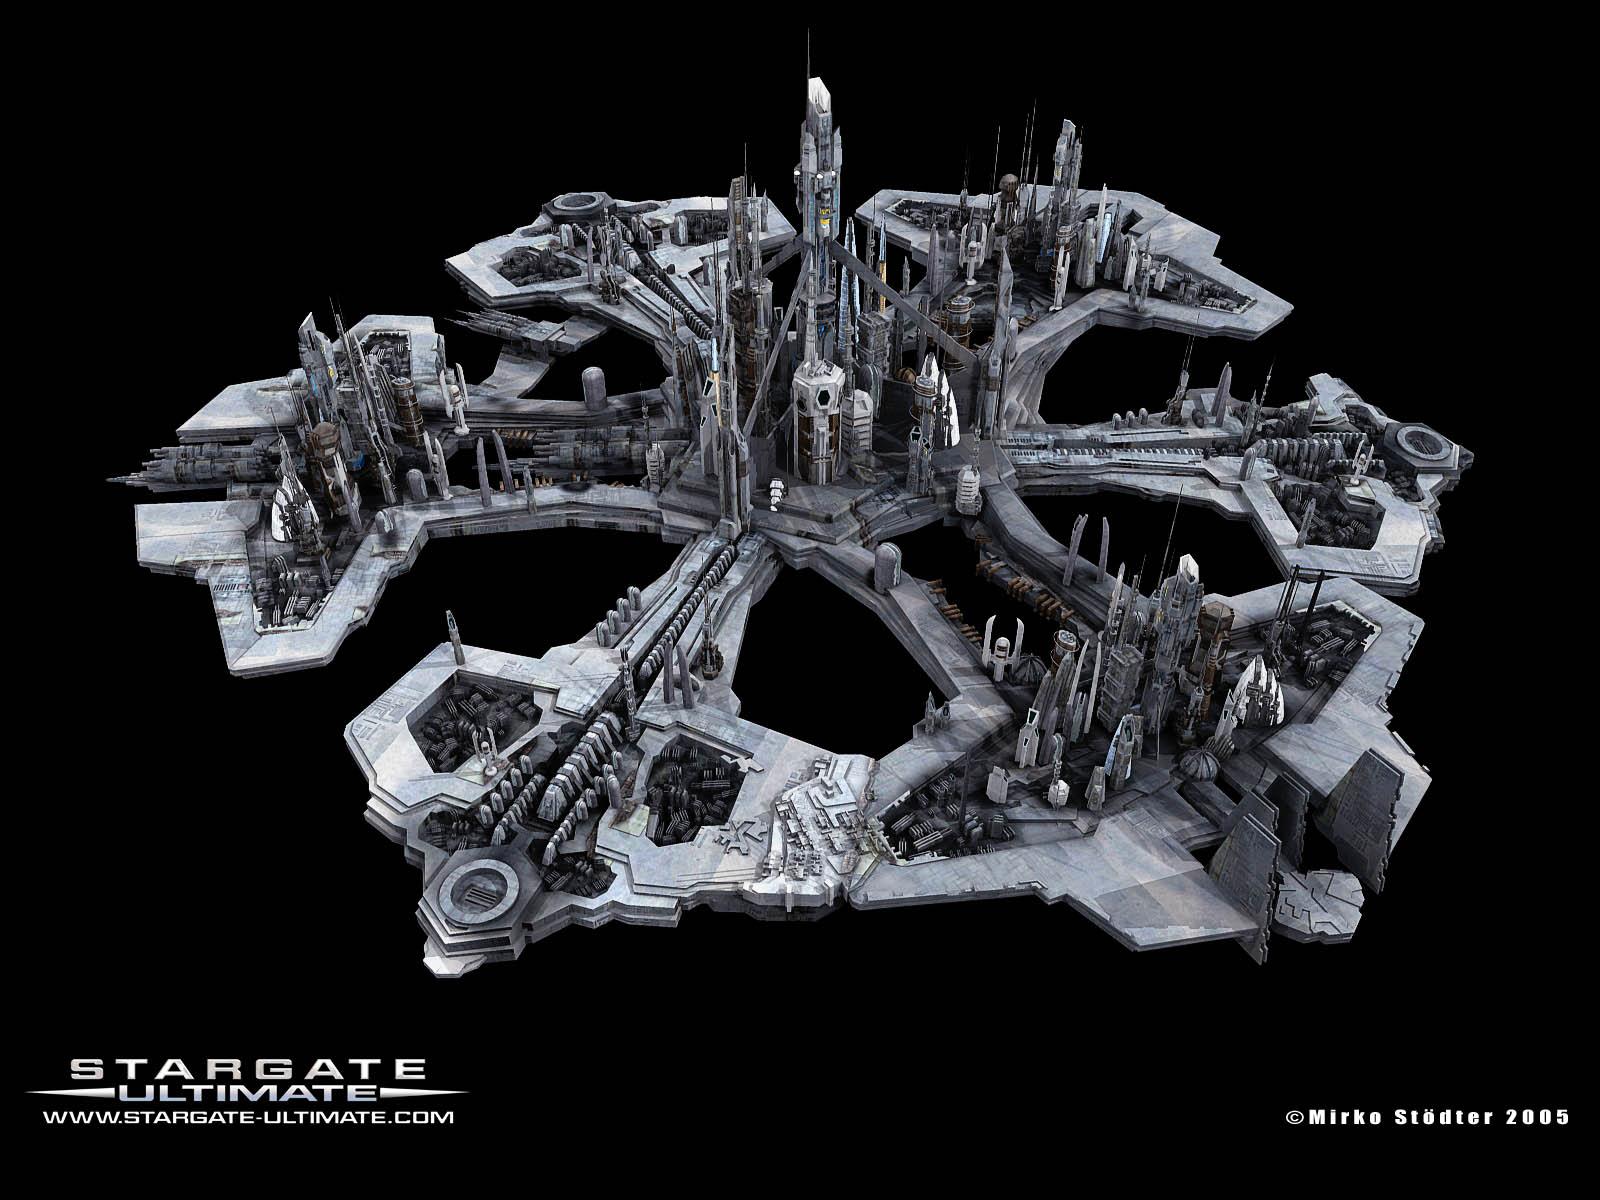 TV Show - Stargate SG-1  Wallpaper